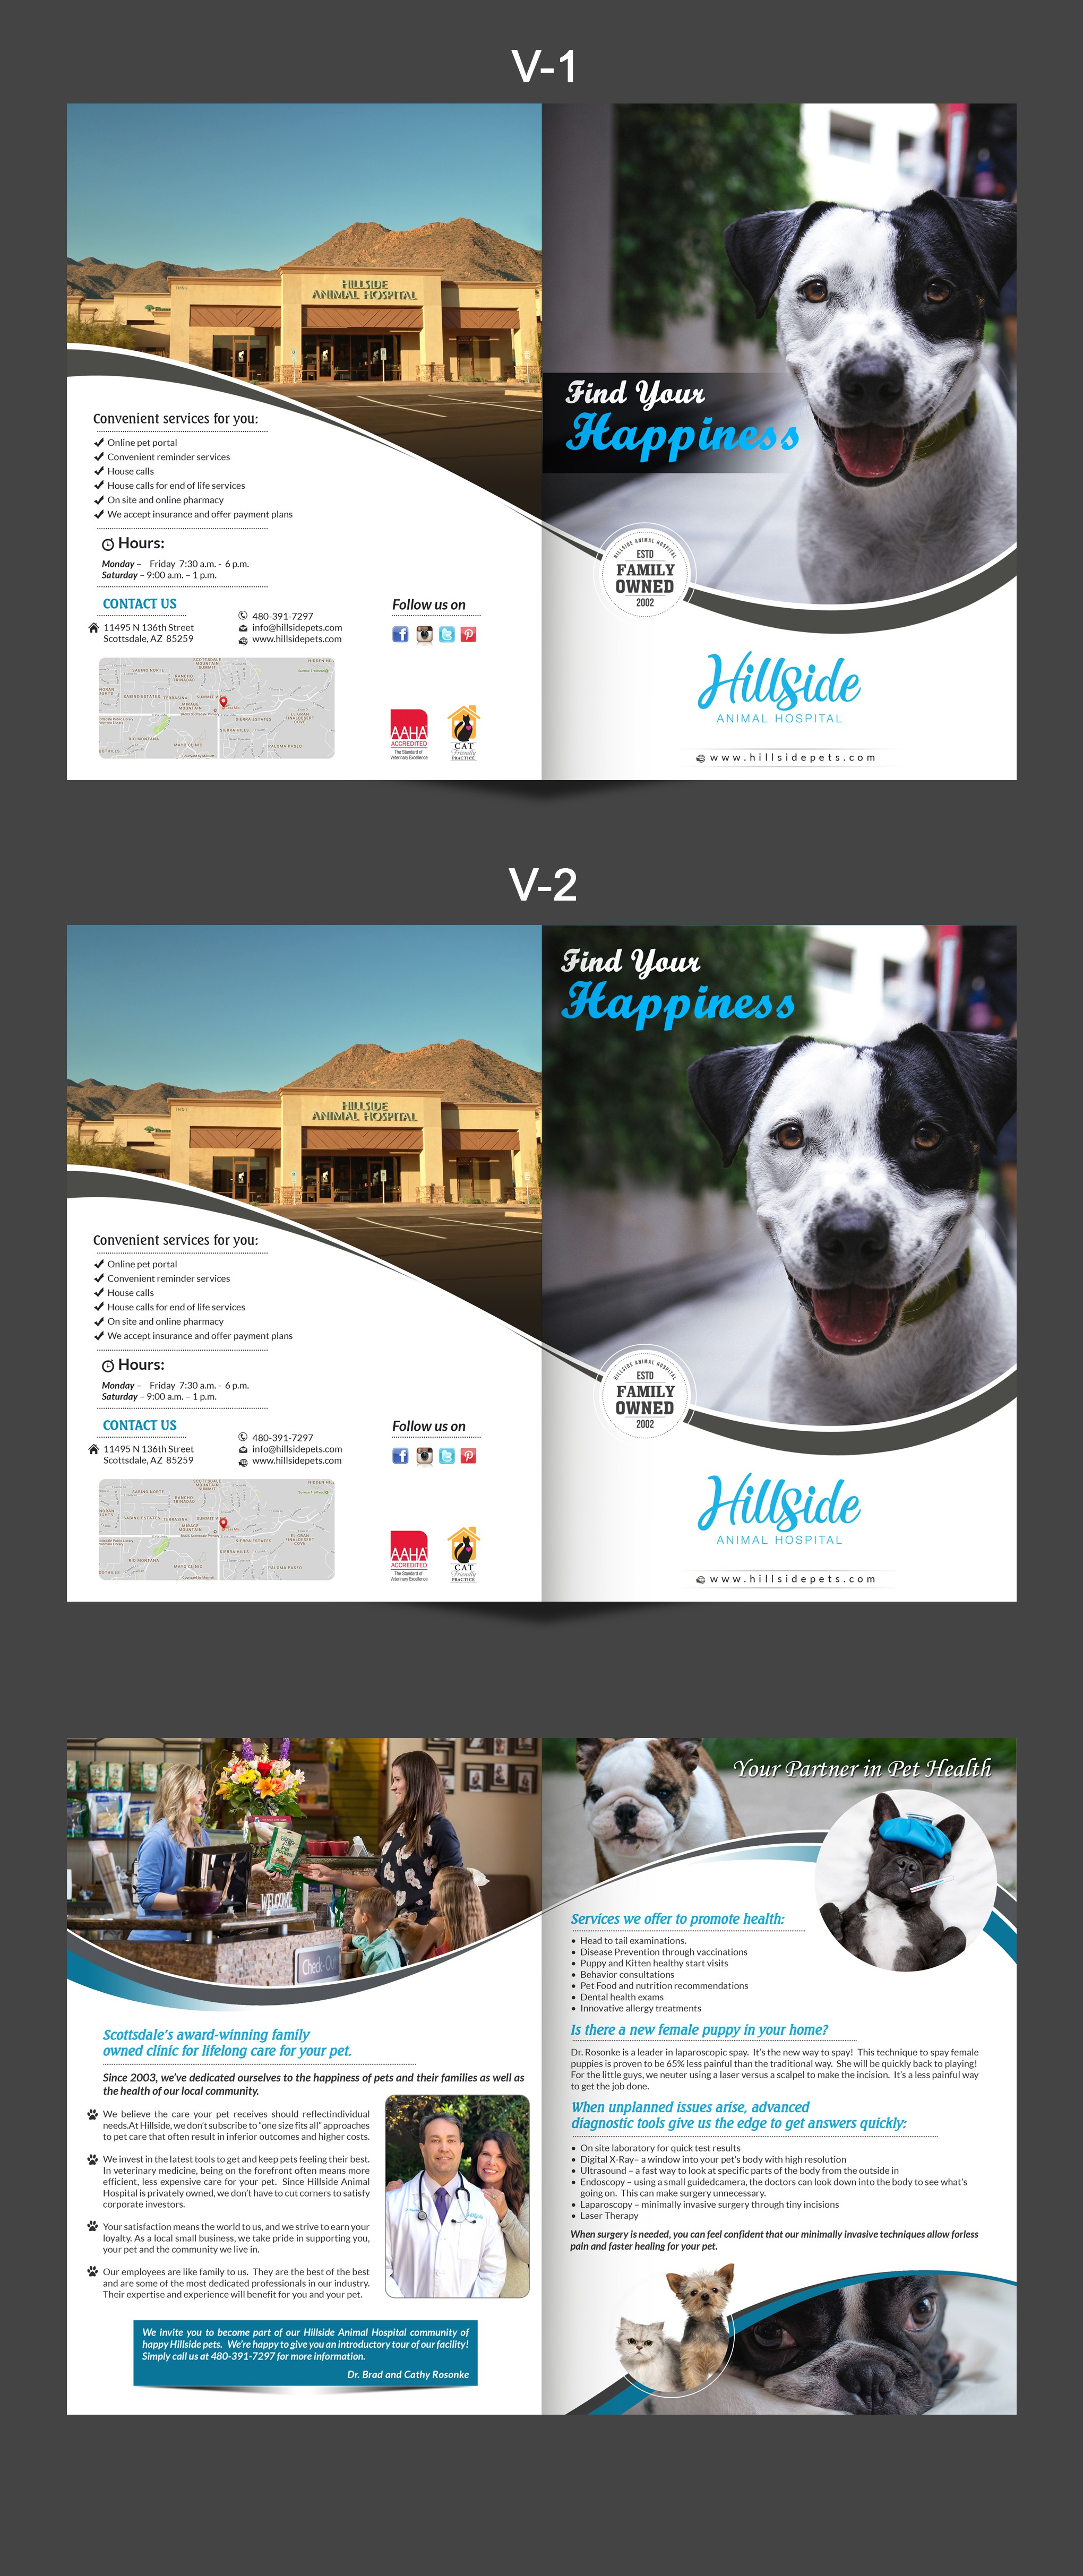 Scottsdale's Top Veterinary Hospital Brochure - Hillside Animal Hospital